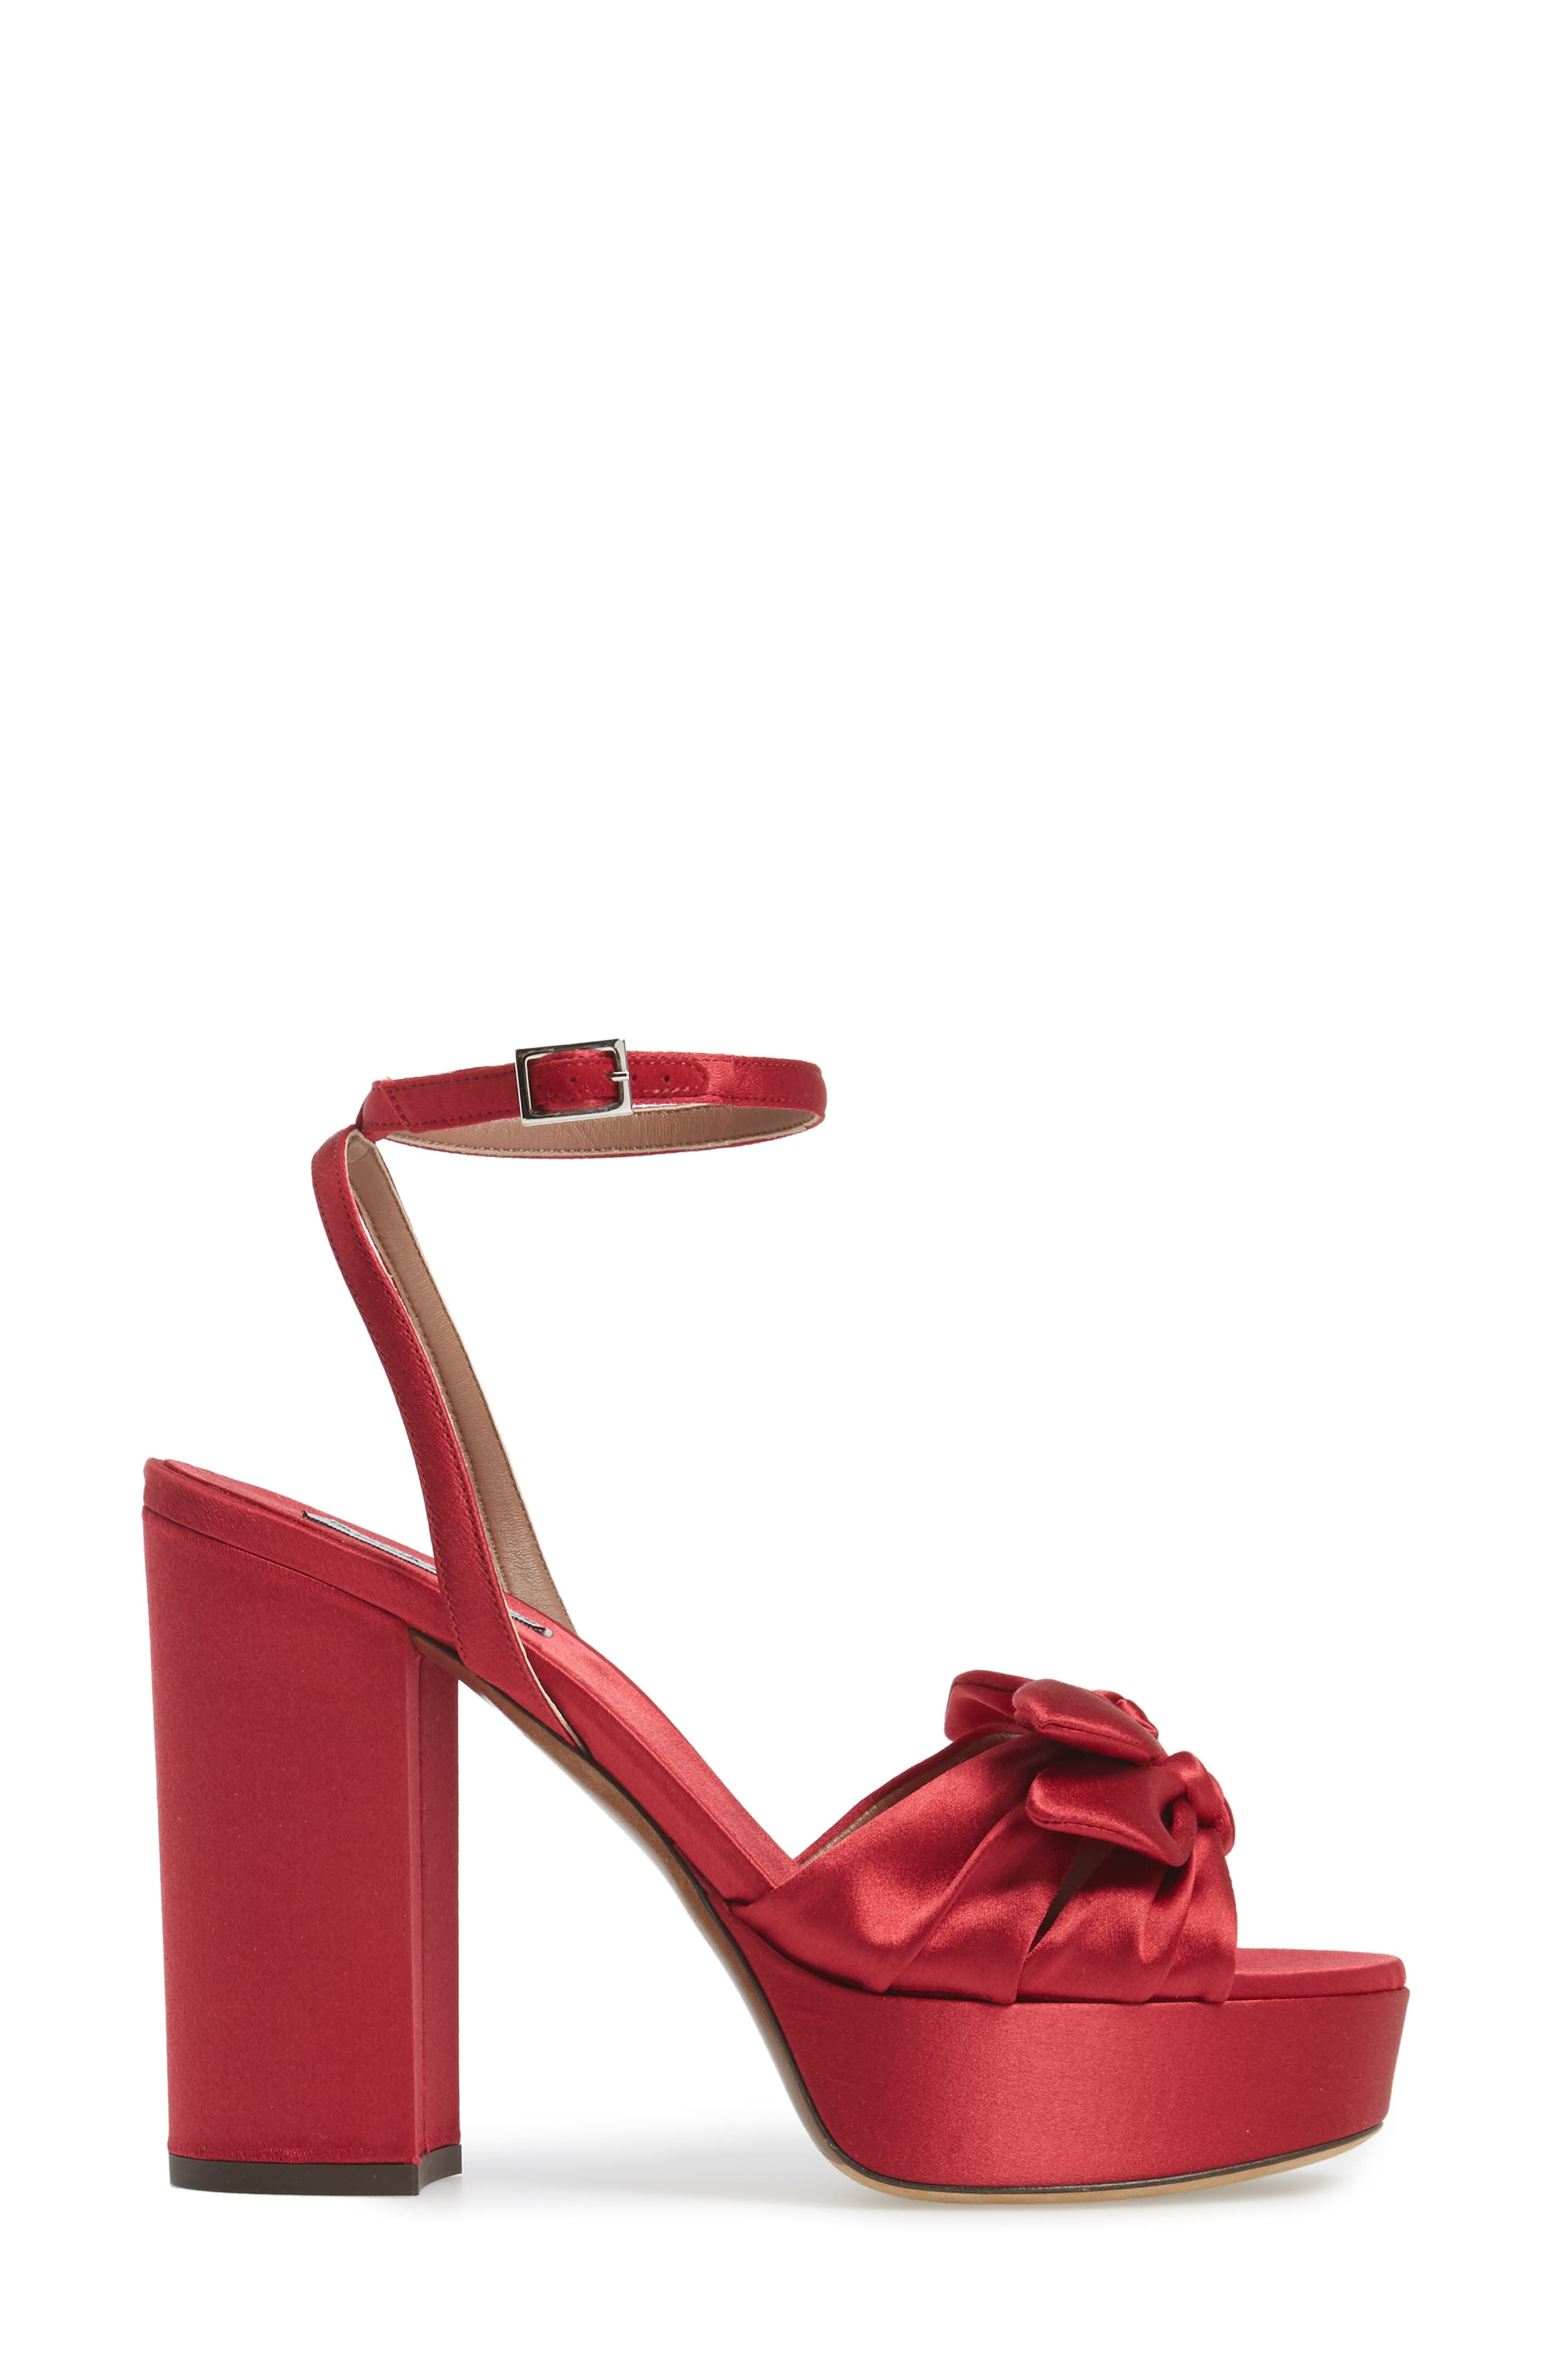 Jodie Platform Sandal,                             Alternate thumbnail 3, color,                             Red